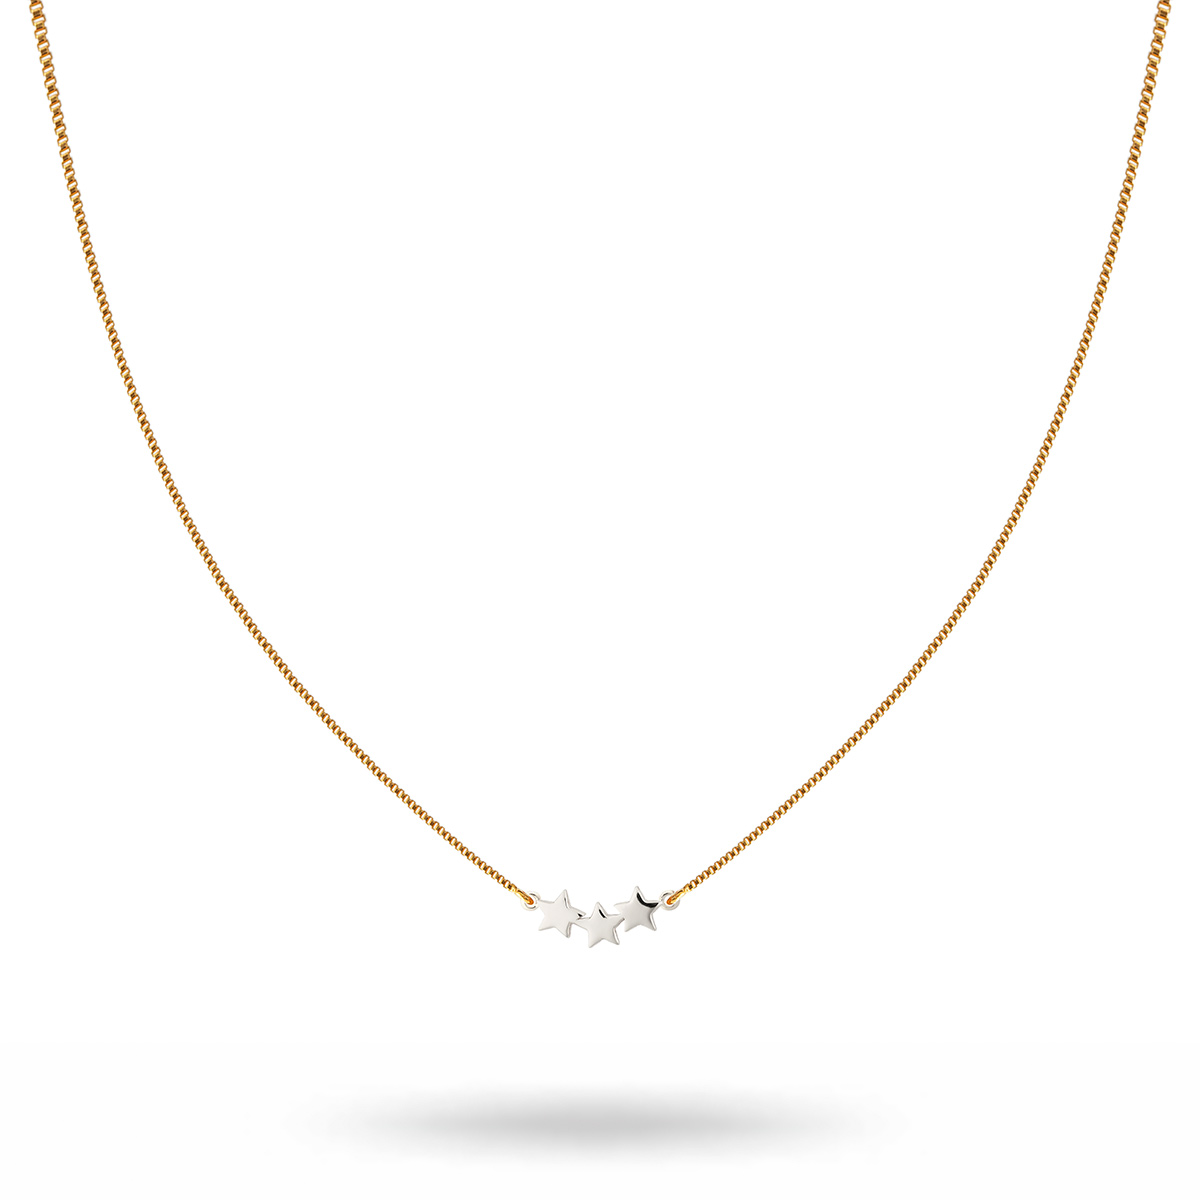 NG1250-1-Snap-necklace-triple-star-plain-gold